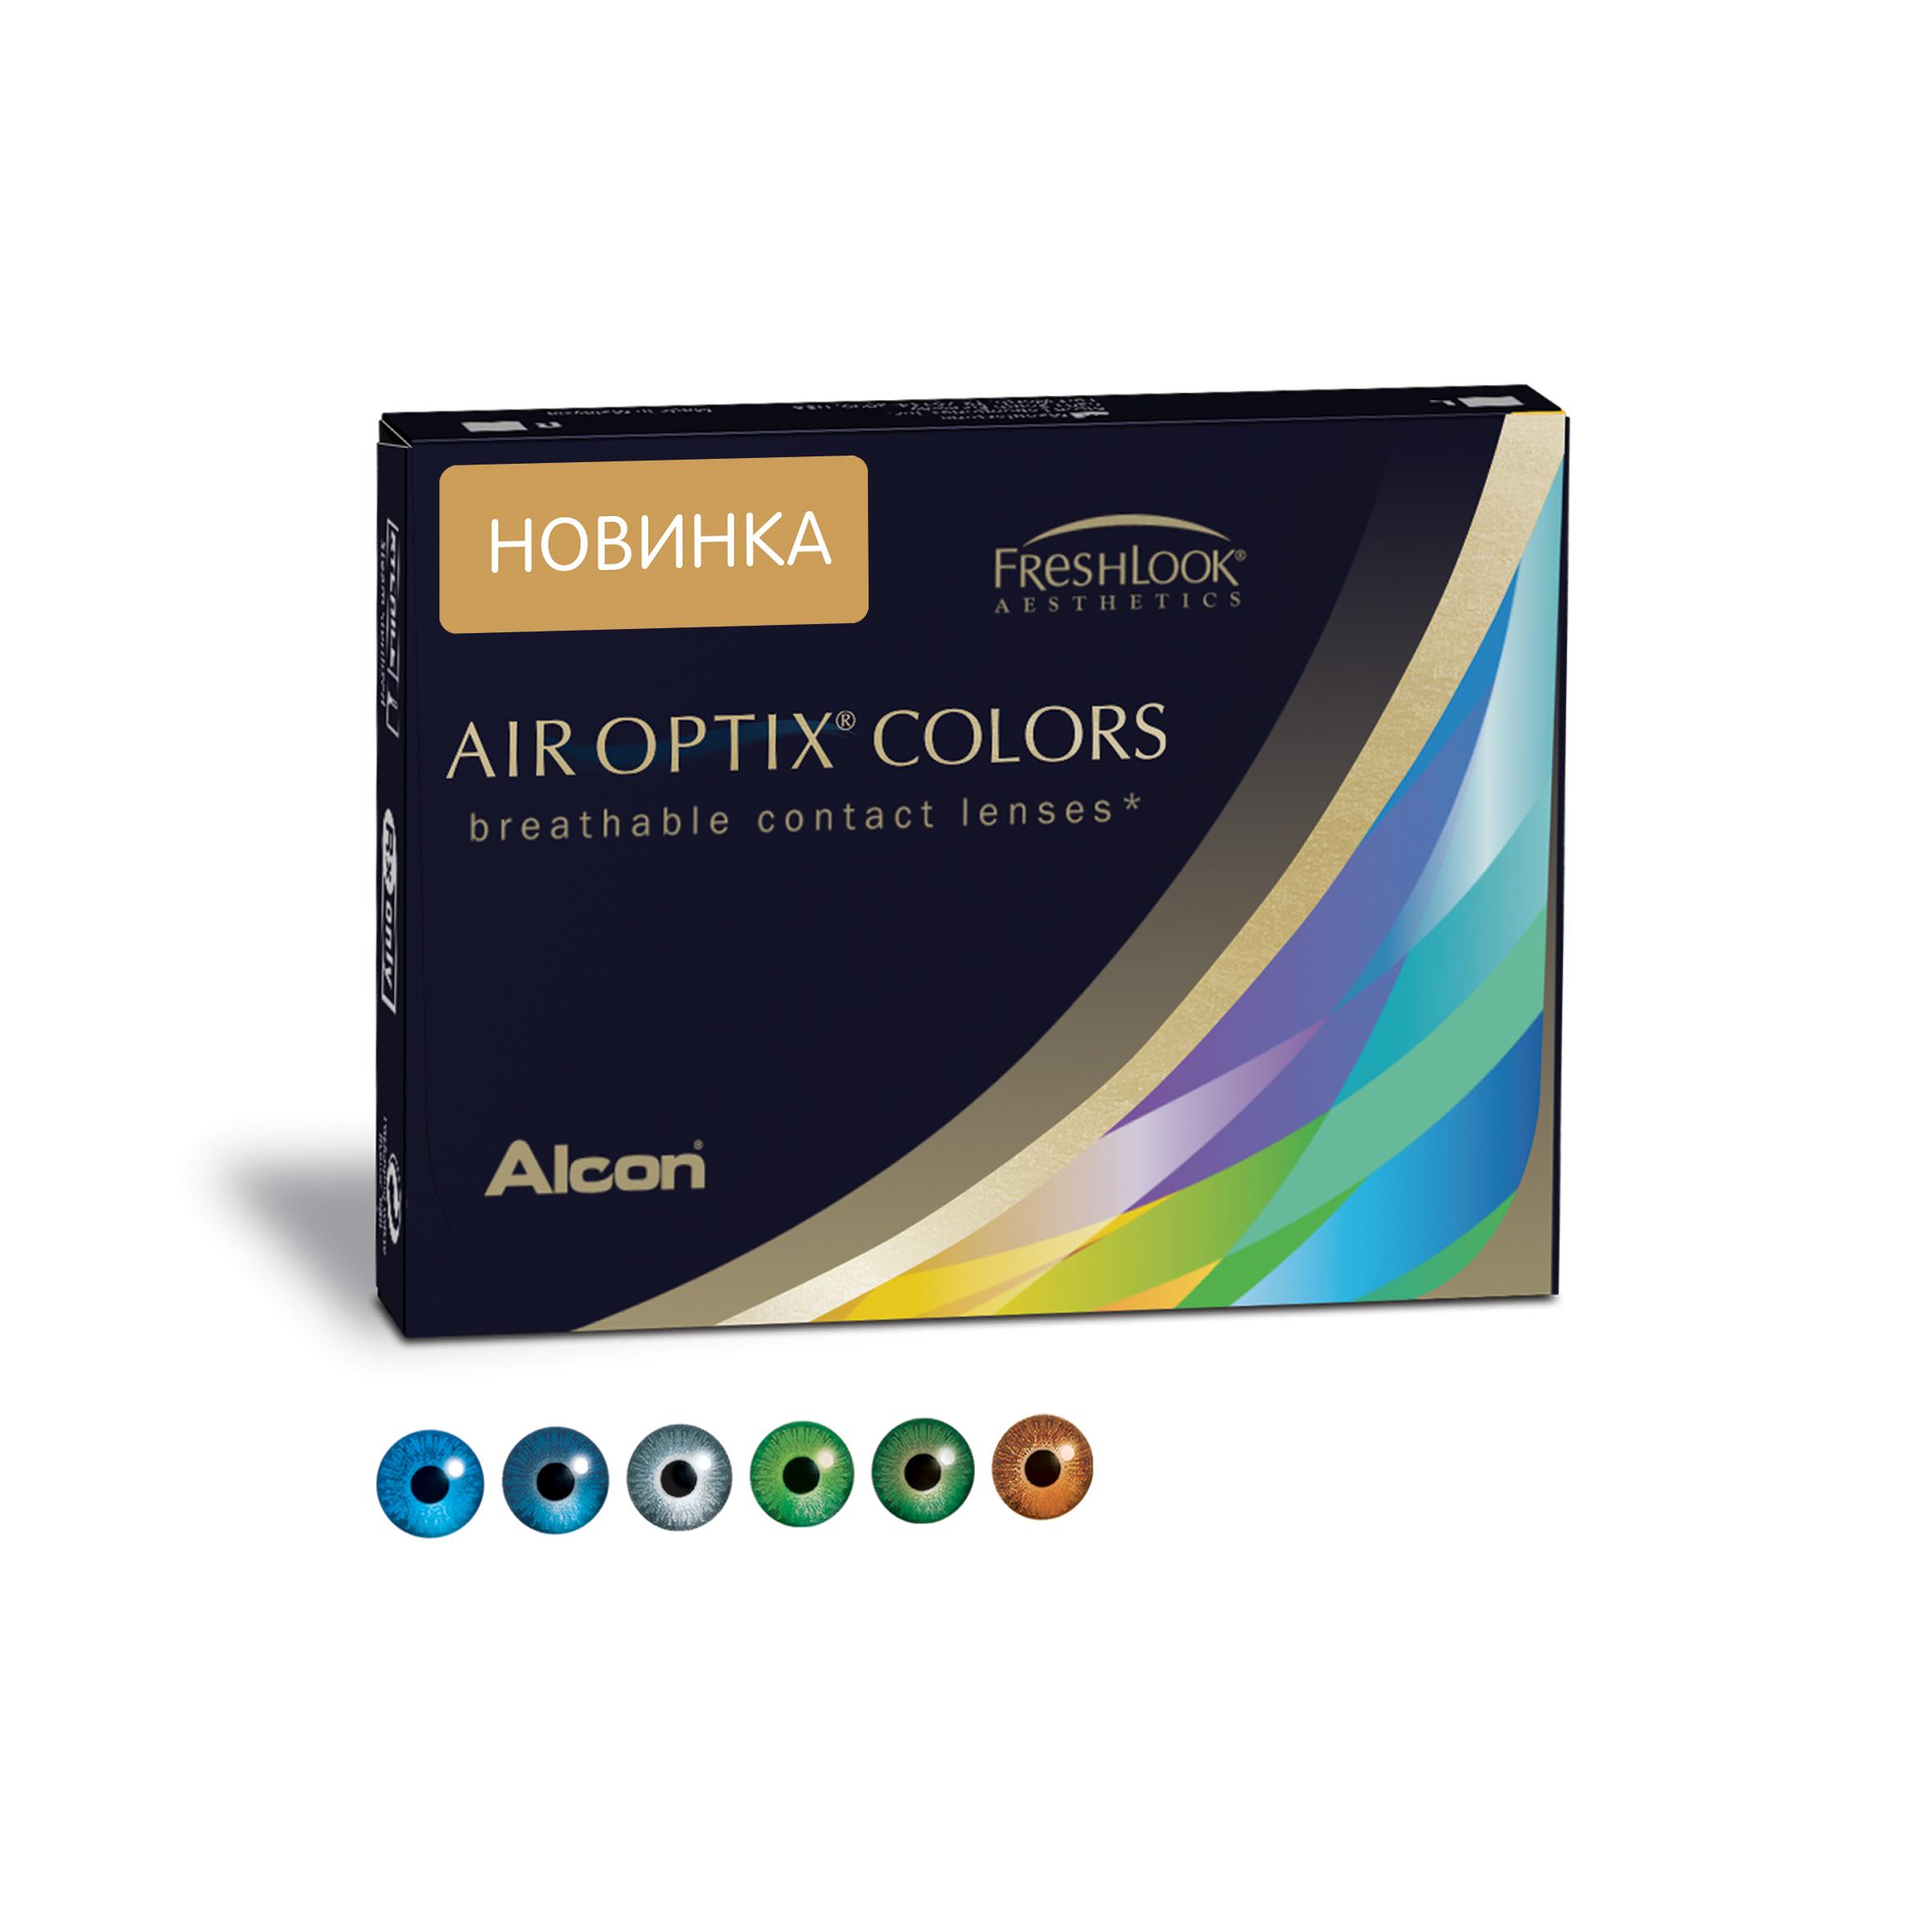 Аlcon контактные линзы Air Optix Colors 2 шт -2.00 Brilliant Blue